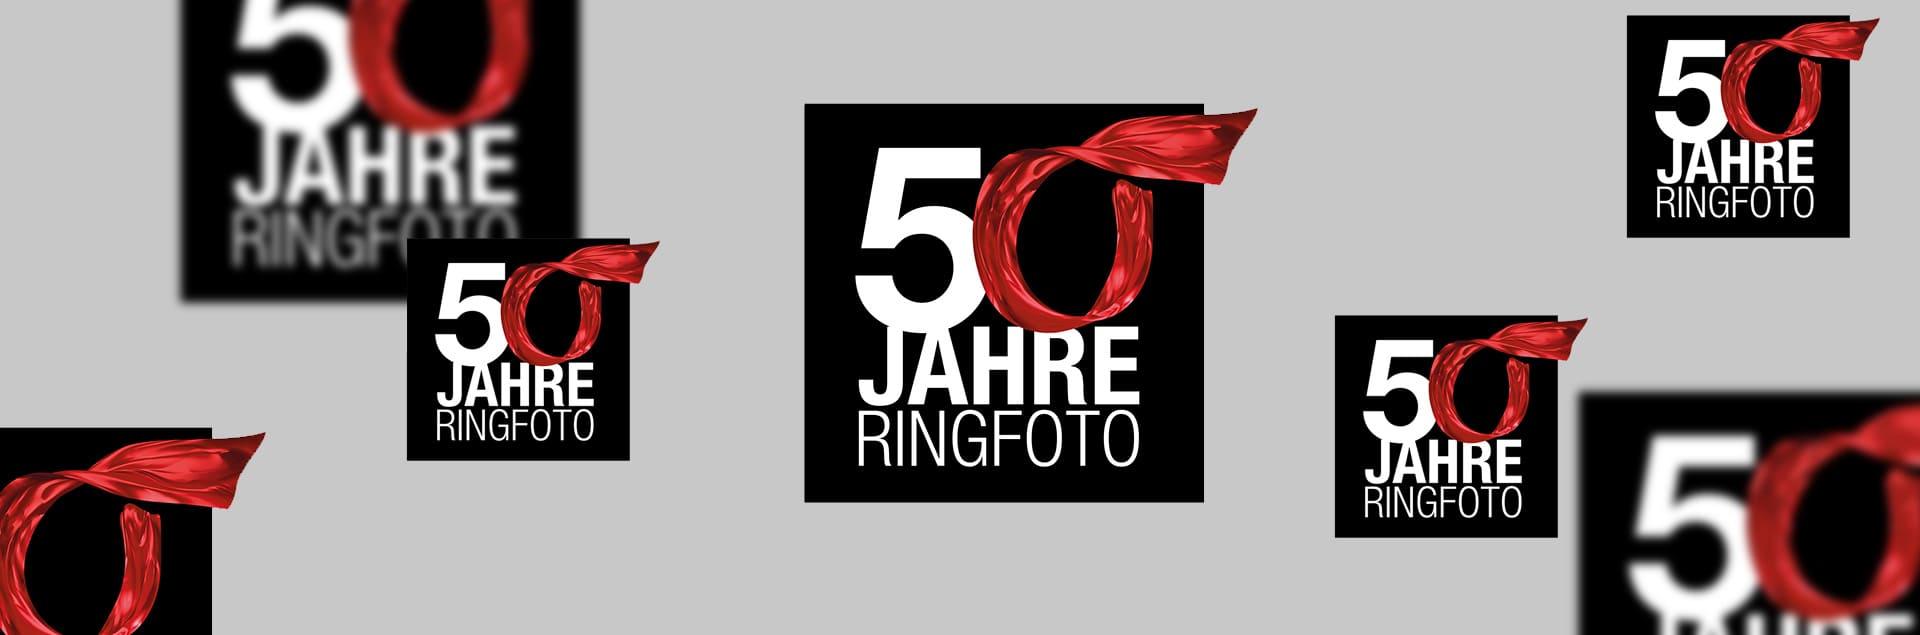 Ringfoto-Gruppe-Fuerth